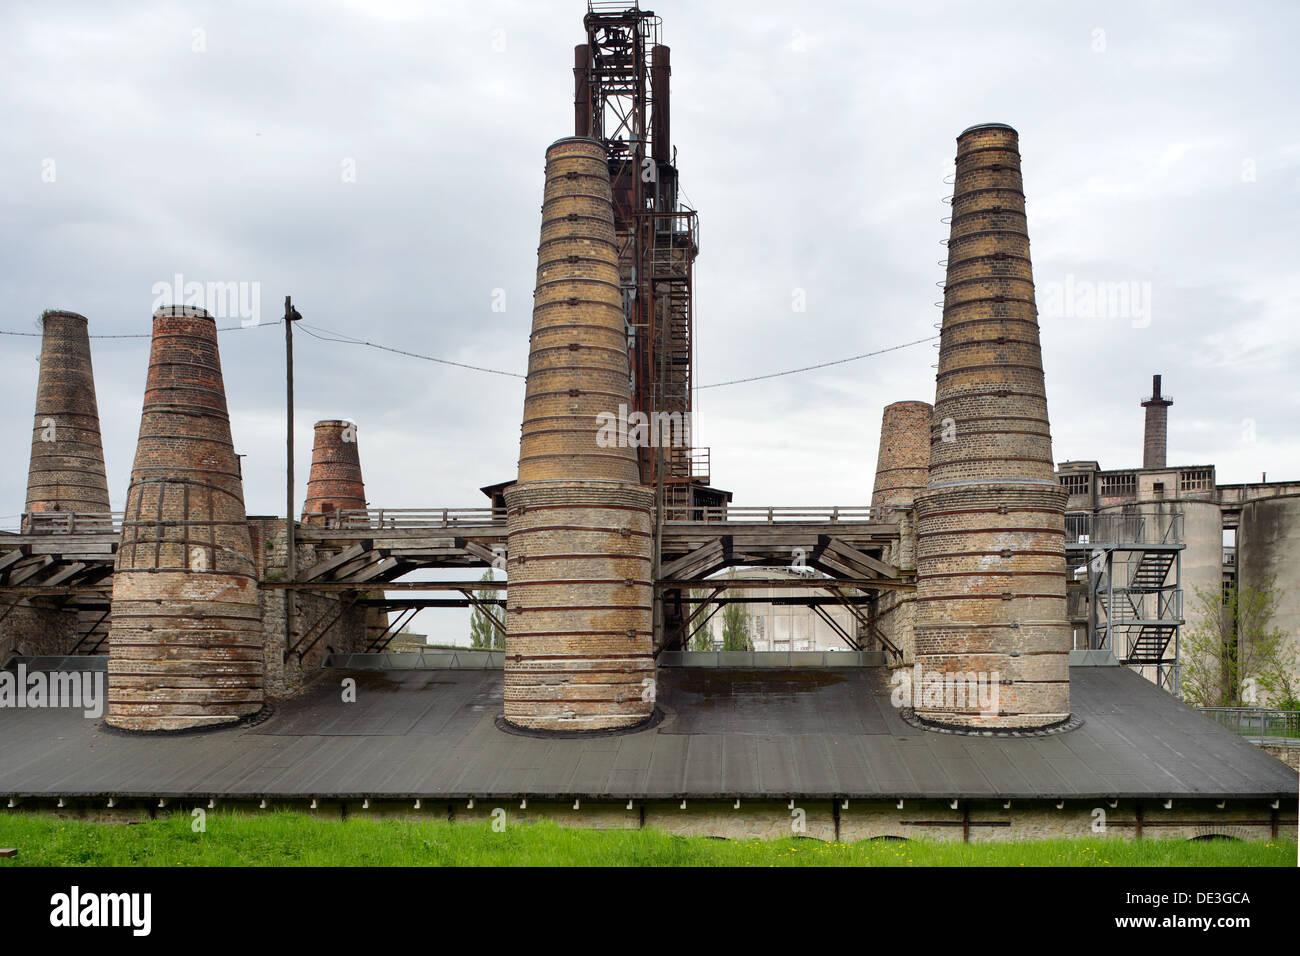 Ruedersdorf, Germany, ruin the shaft furnace battery, Museum Park Ruedersdorf - Stock Image